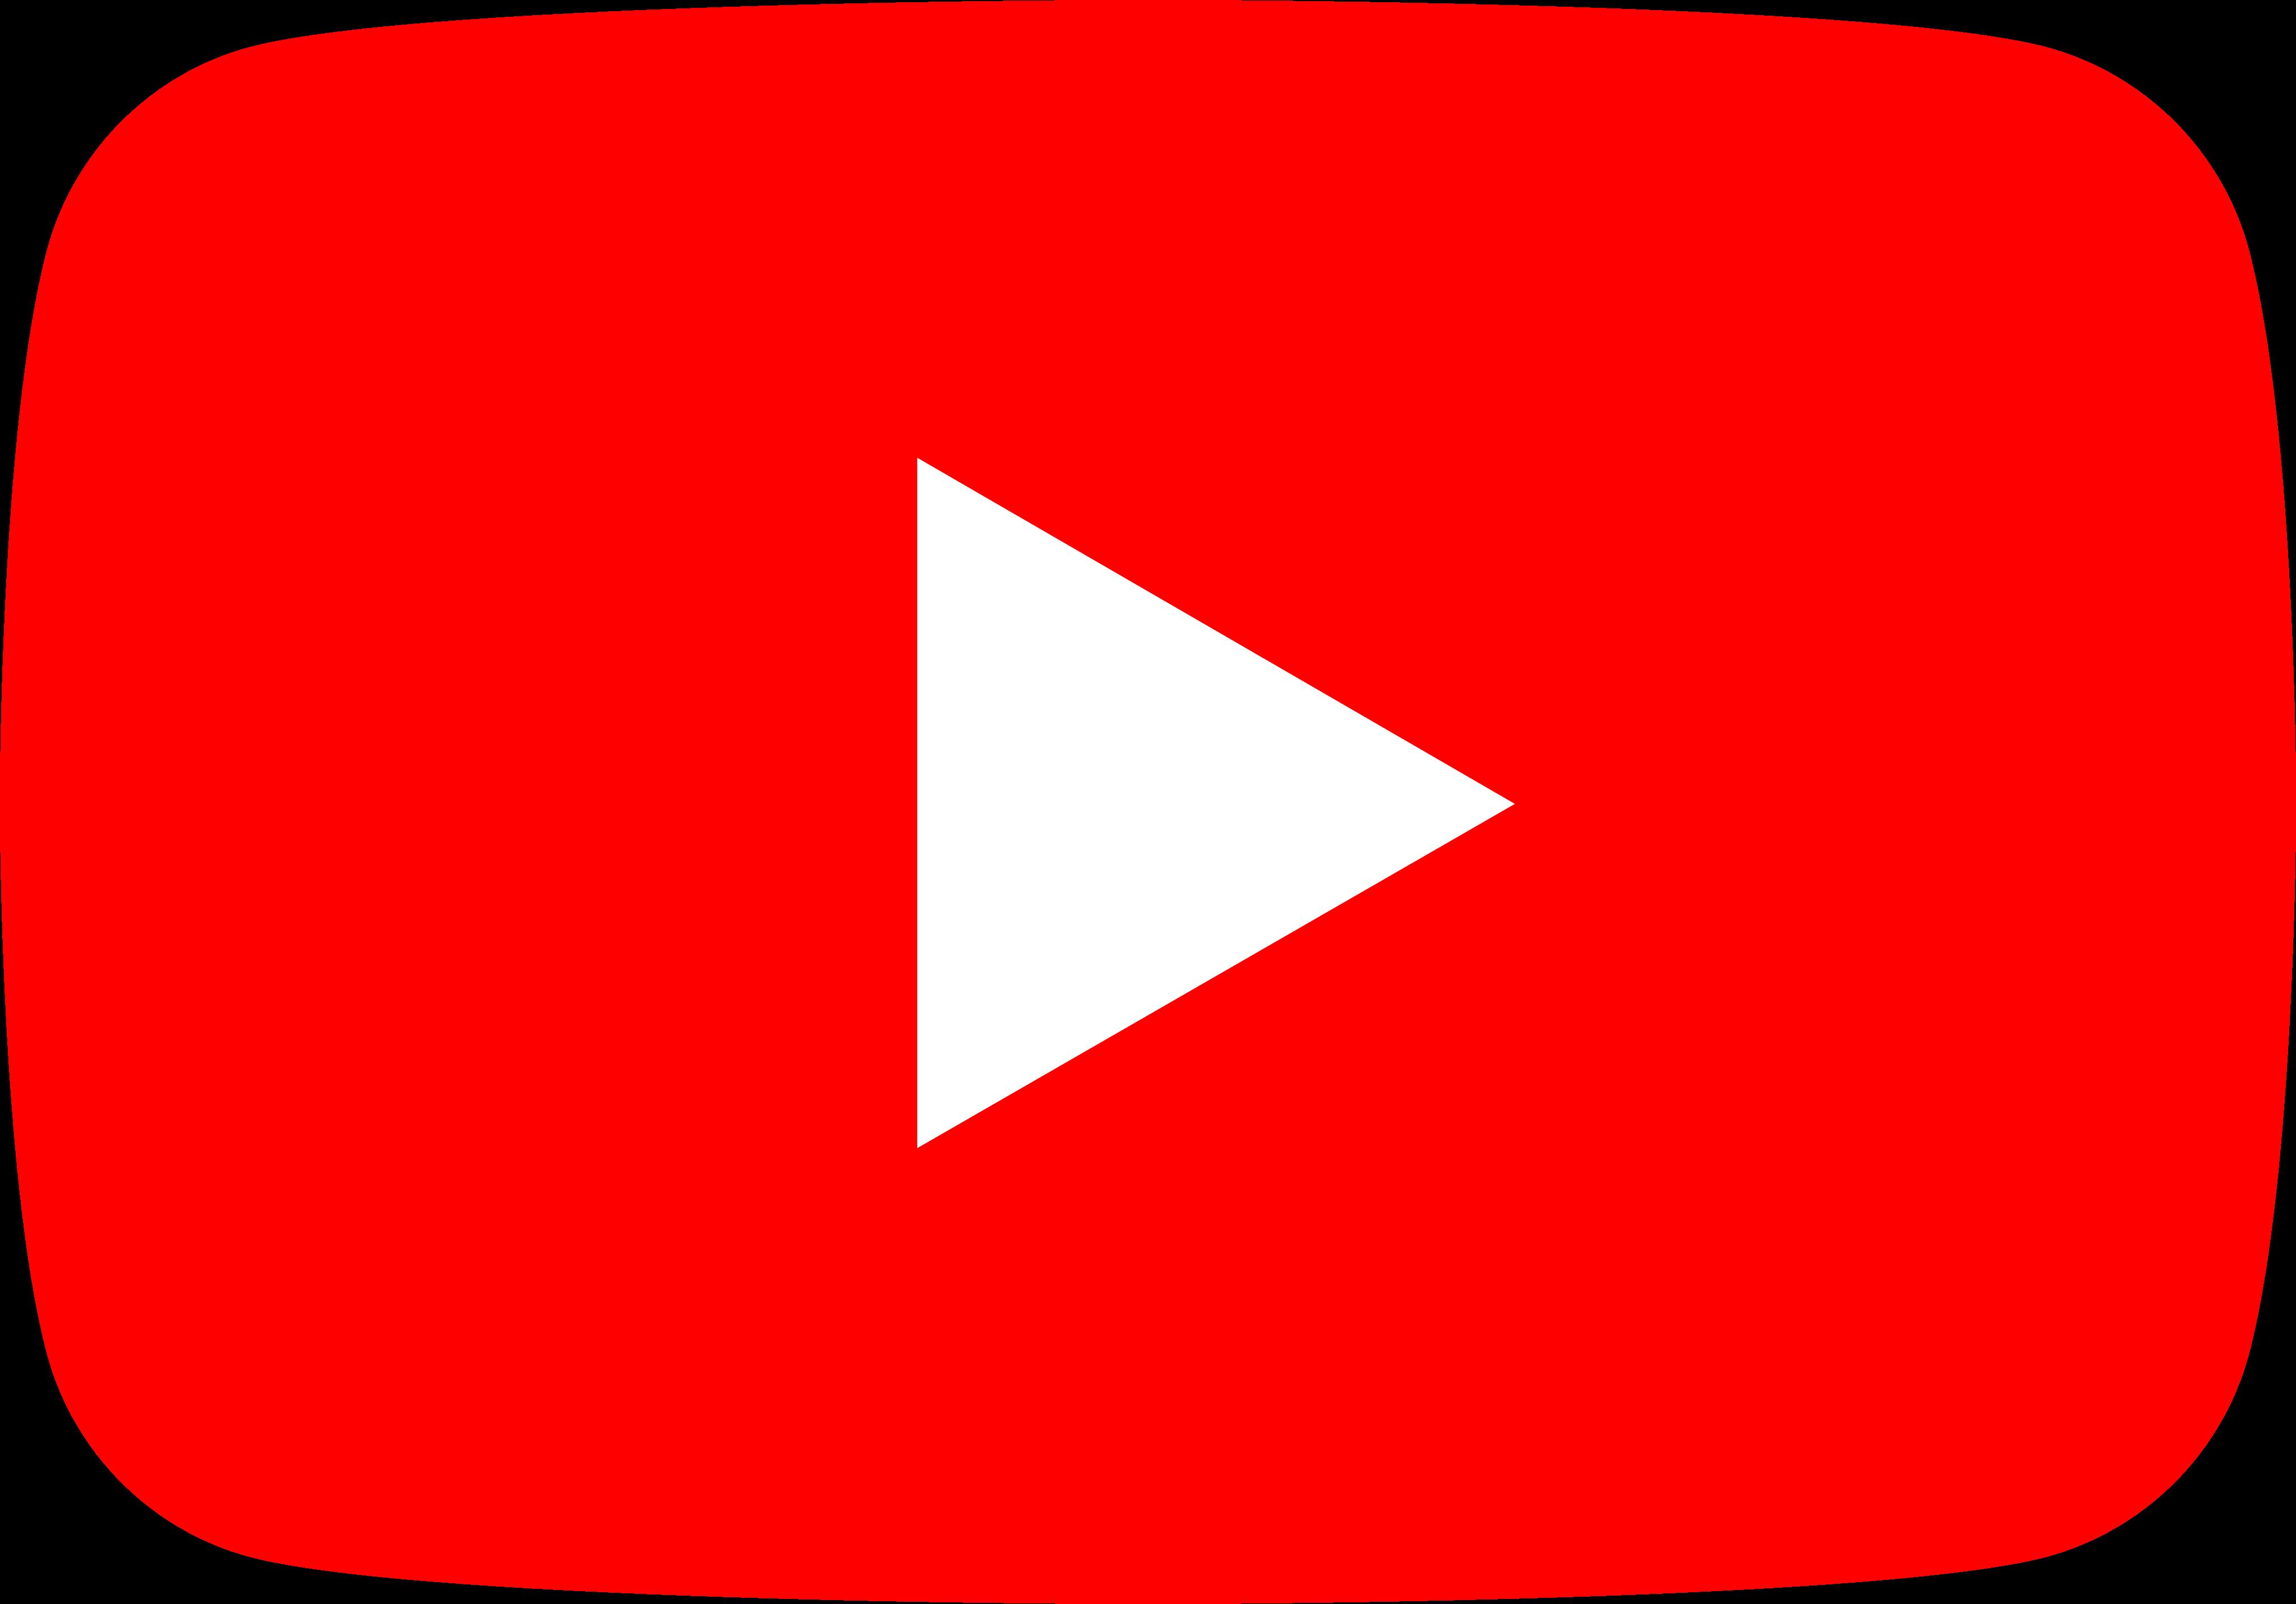 youtube-logo-5-2